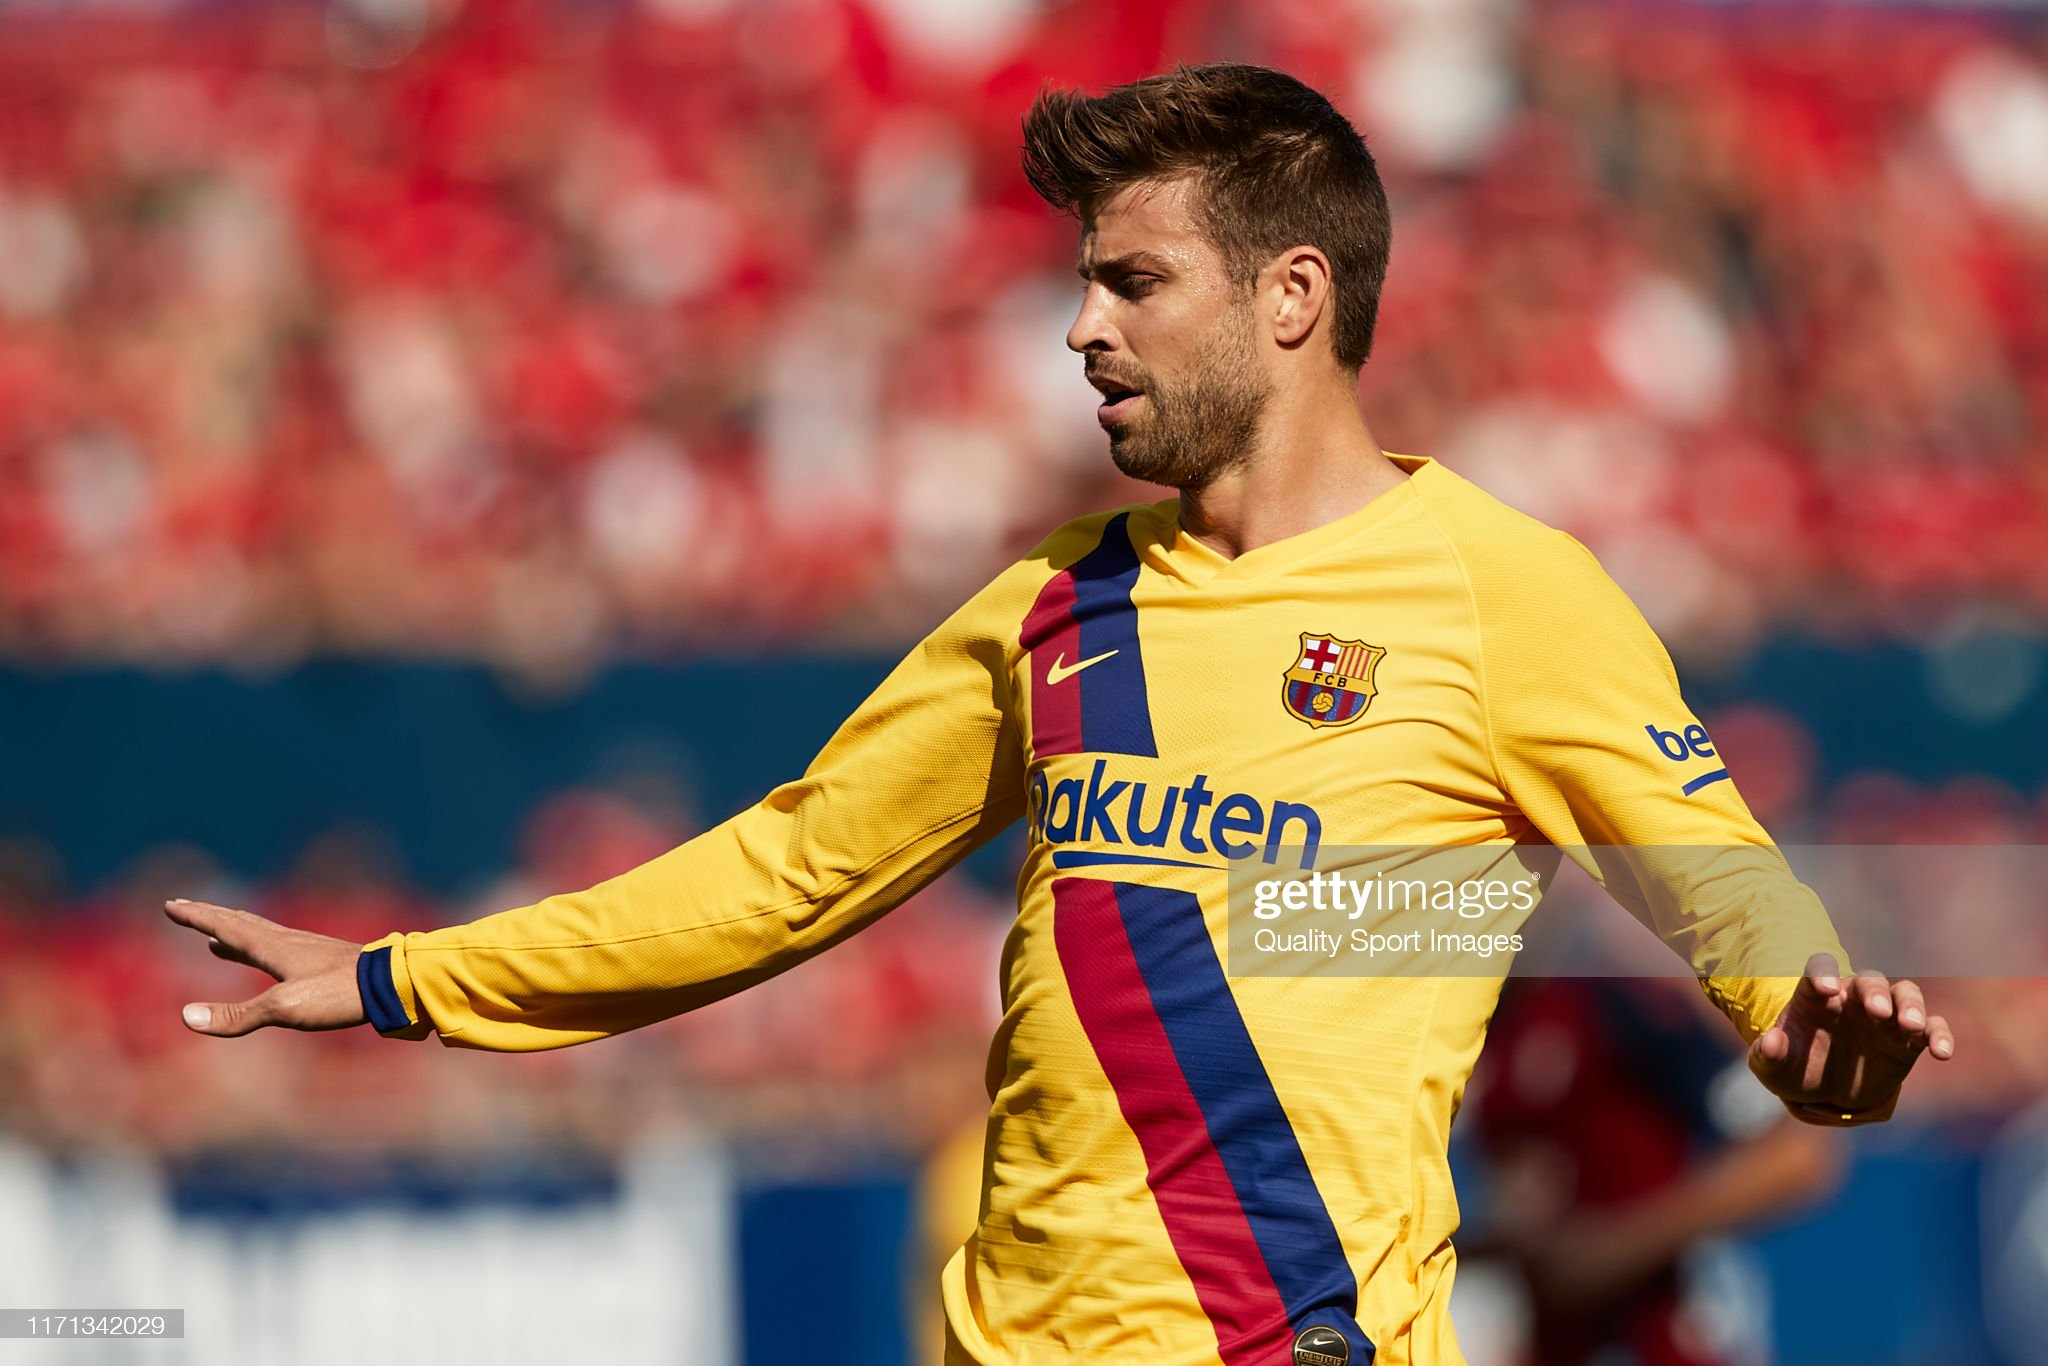 صور مباراة : أوساسونا - برشلونة 2-2 ( 31-08-2019 )  Gerard-pique-of-fc-barcelona-reacts-during-the-liga-match-between-ca-picture-id1171342029?s=2048x2048